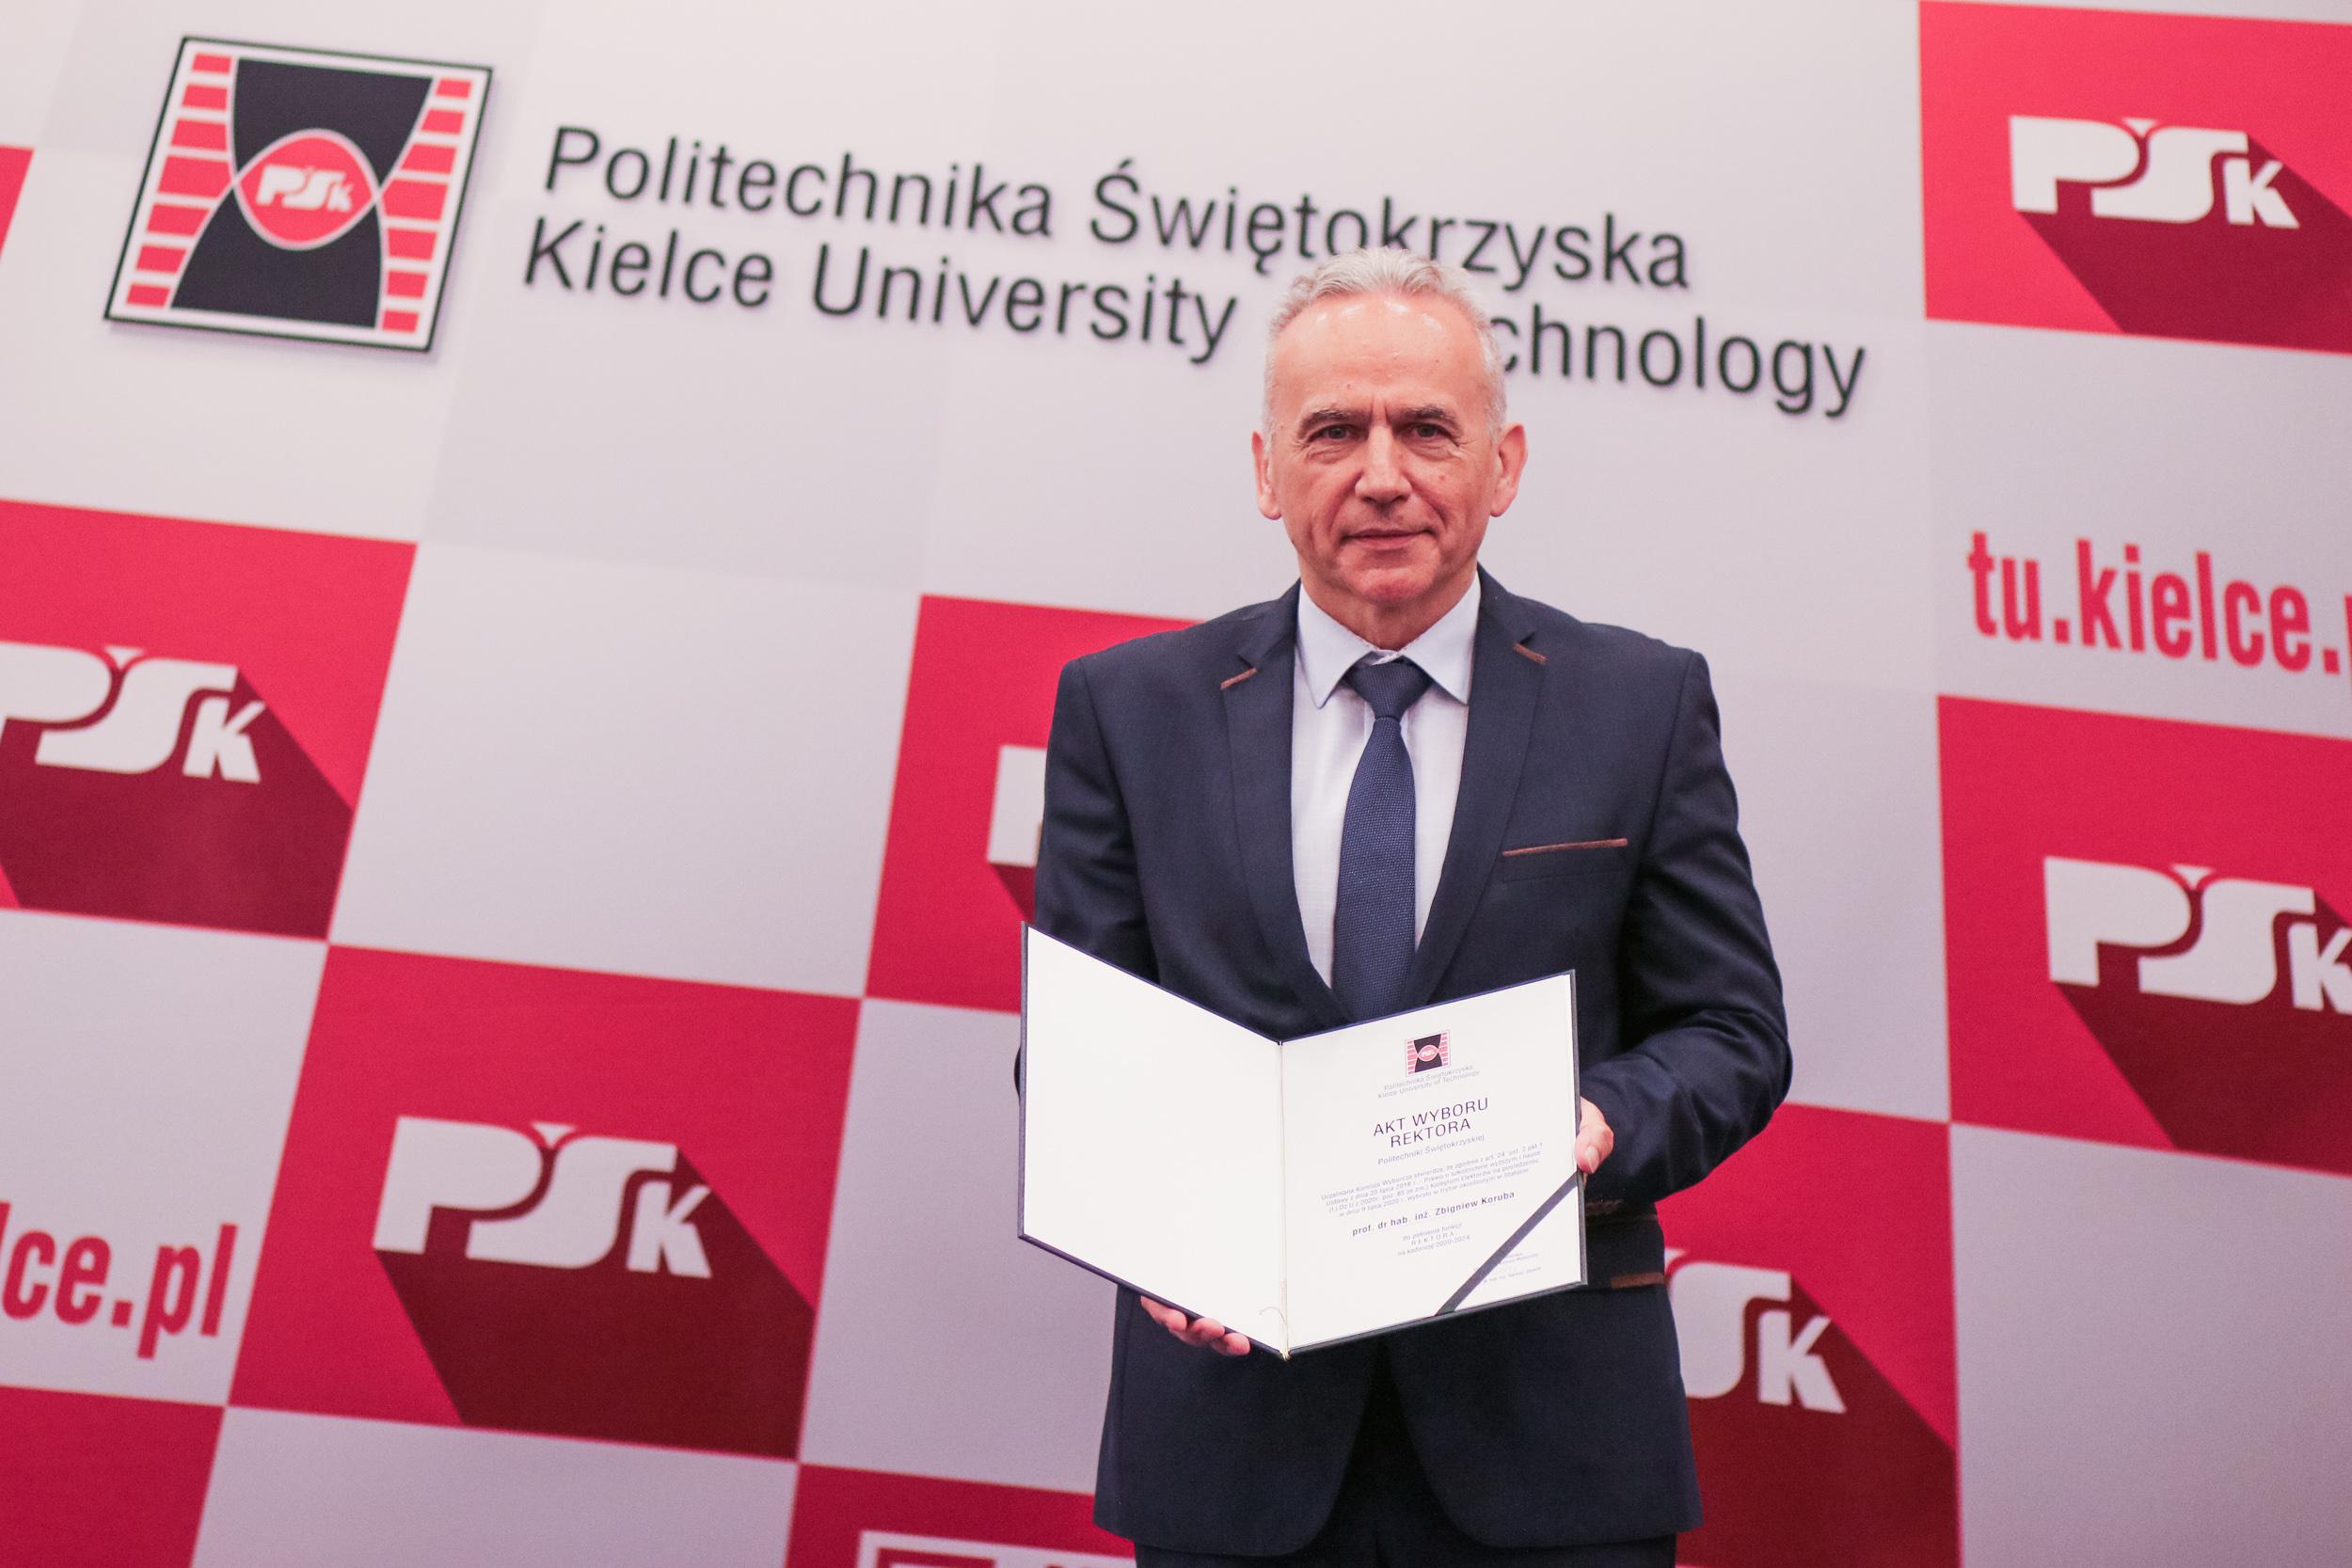 Professor Koruba becomes new Rector of the Kielce University of Technology